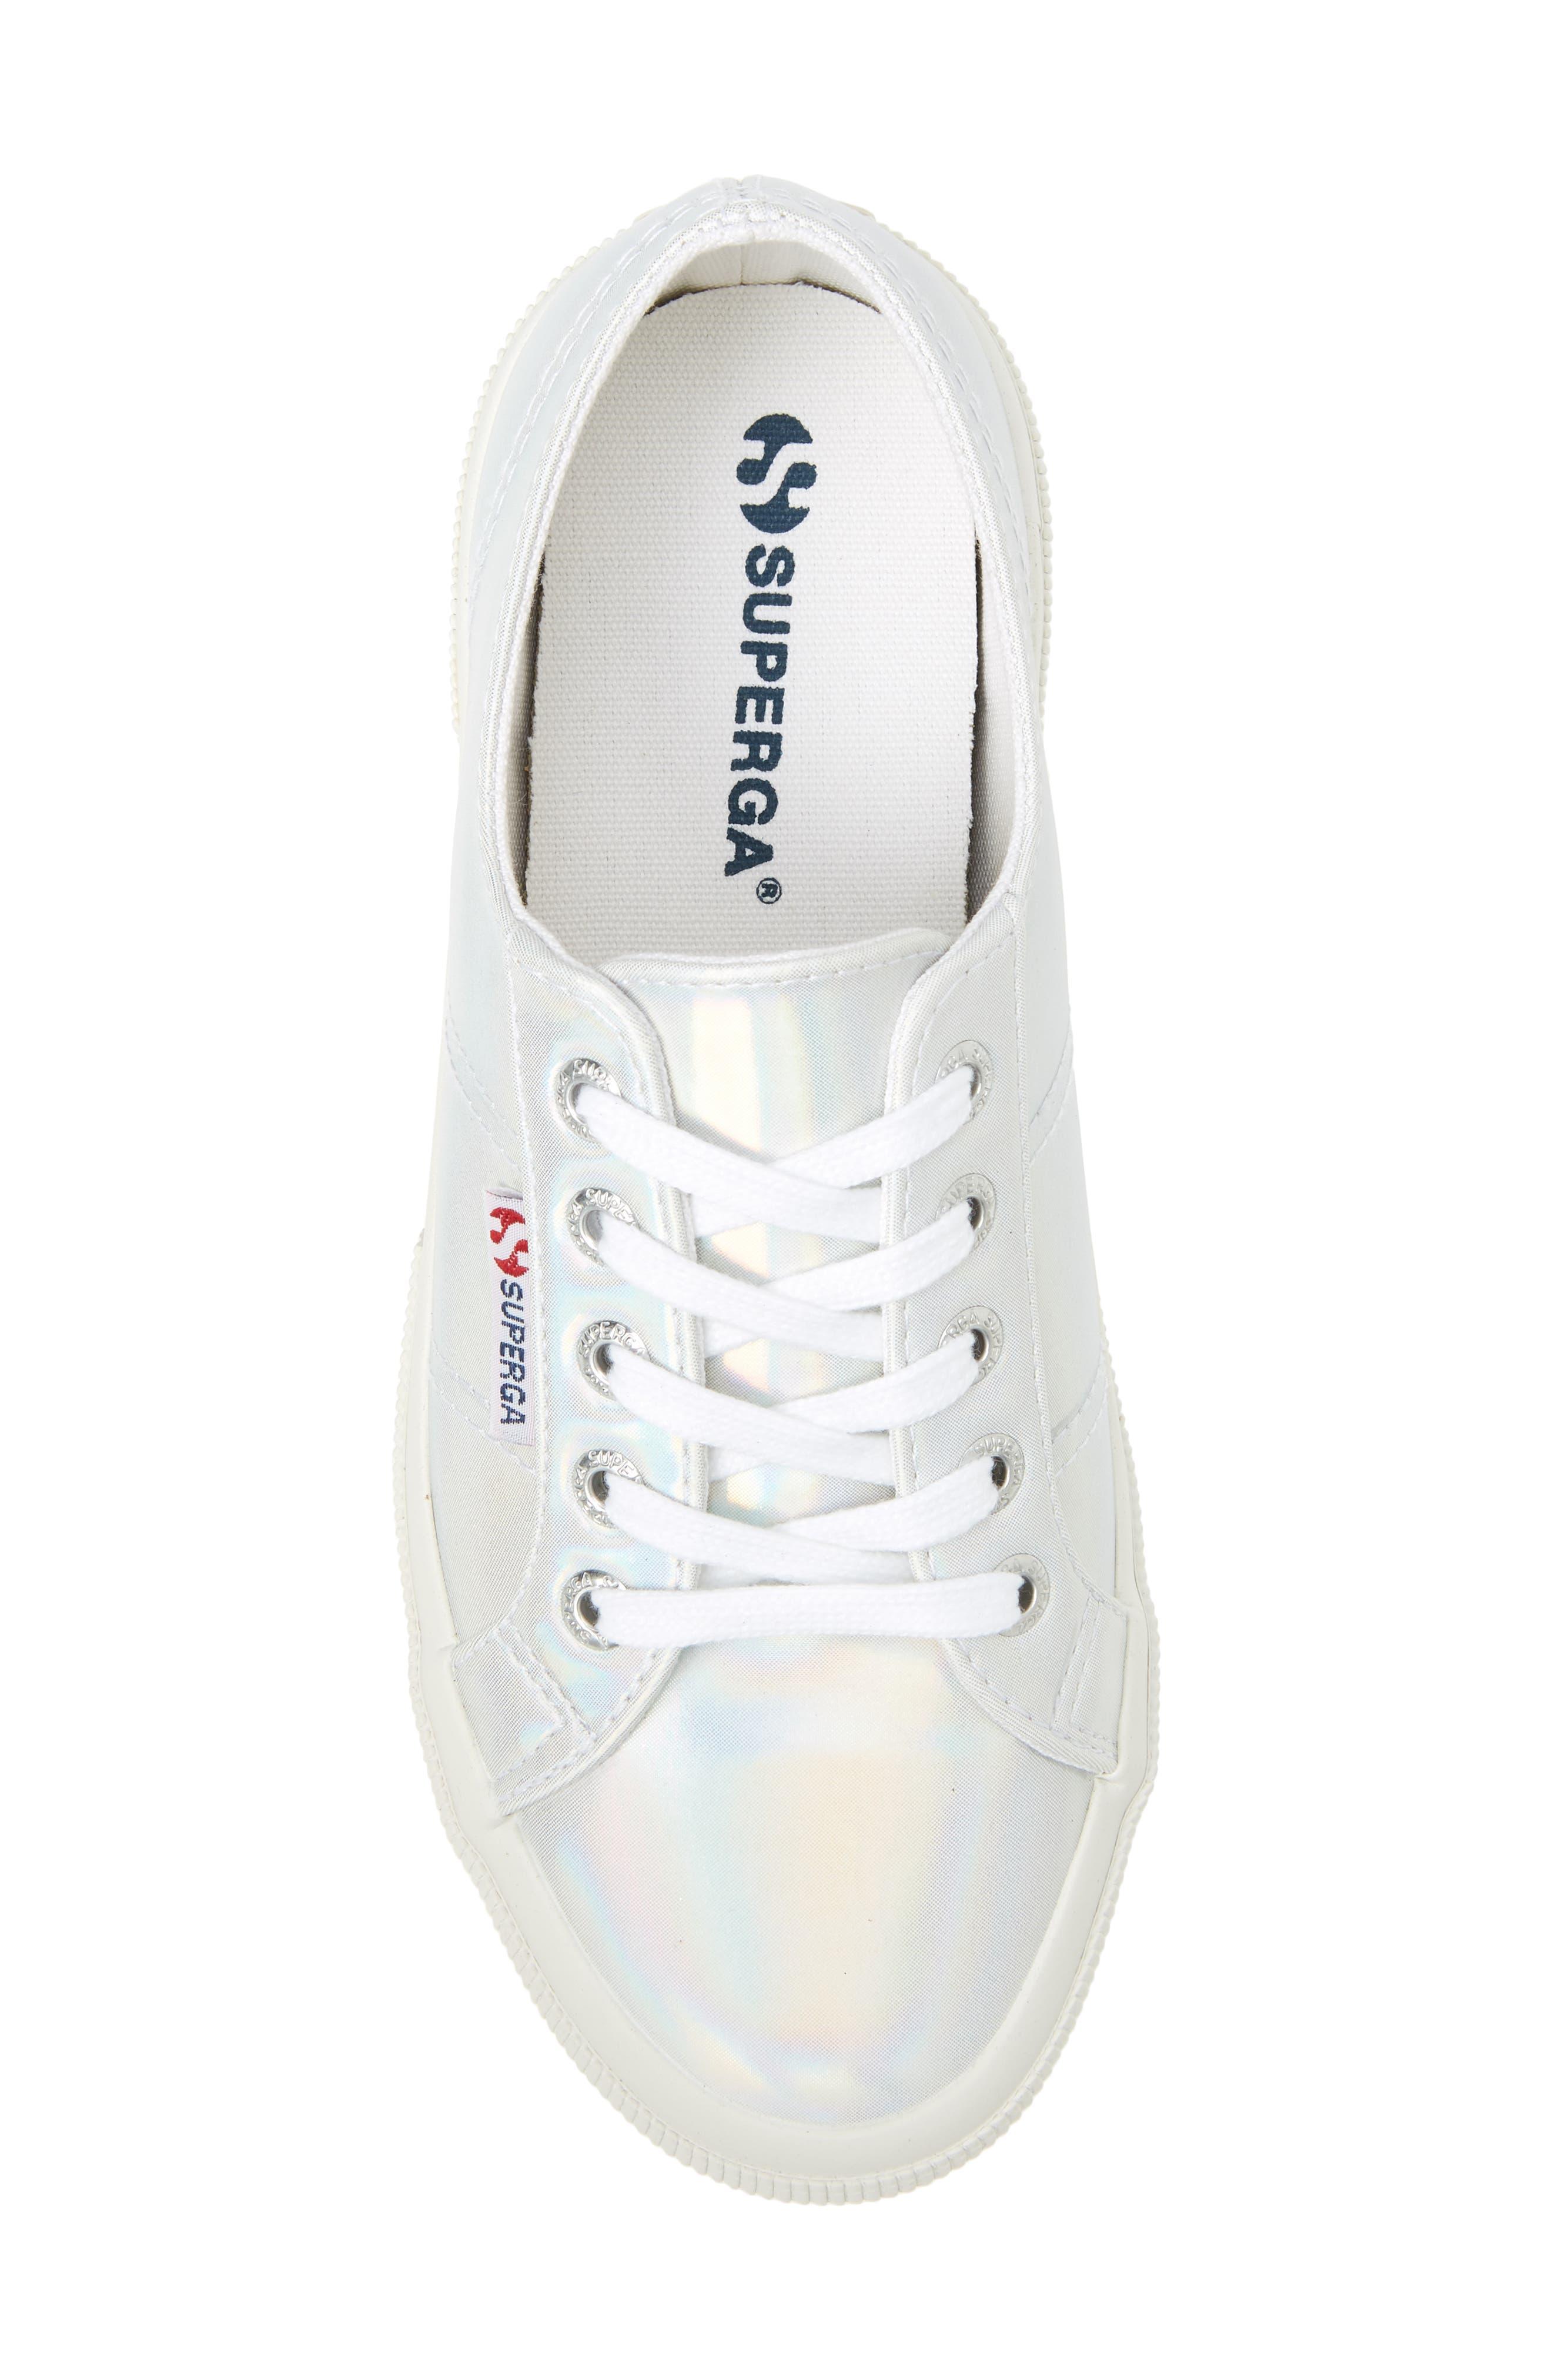 2750 Hologramw Low Top Sneaker,                             Alternate thumbnail 5, color,                             Iridescent